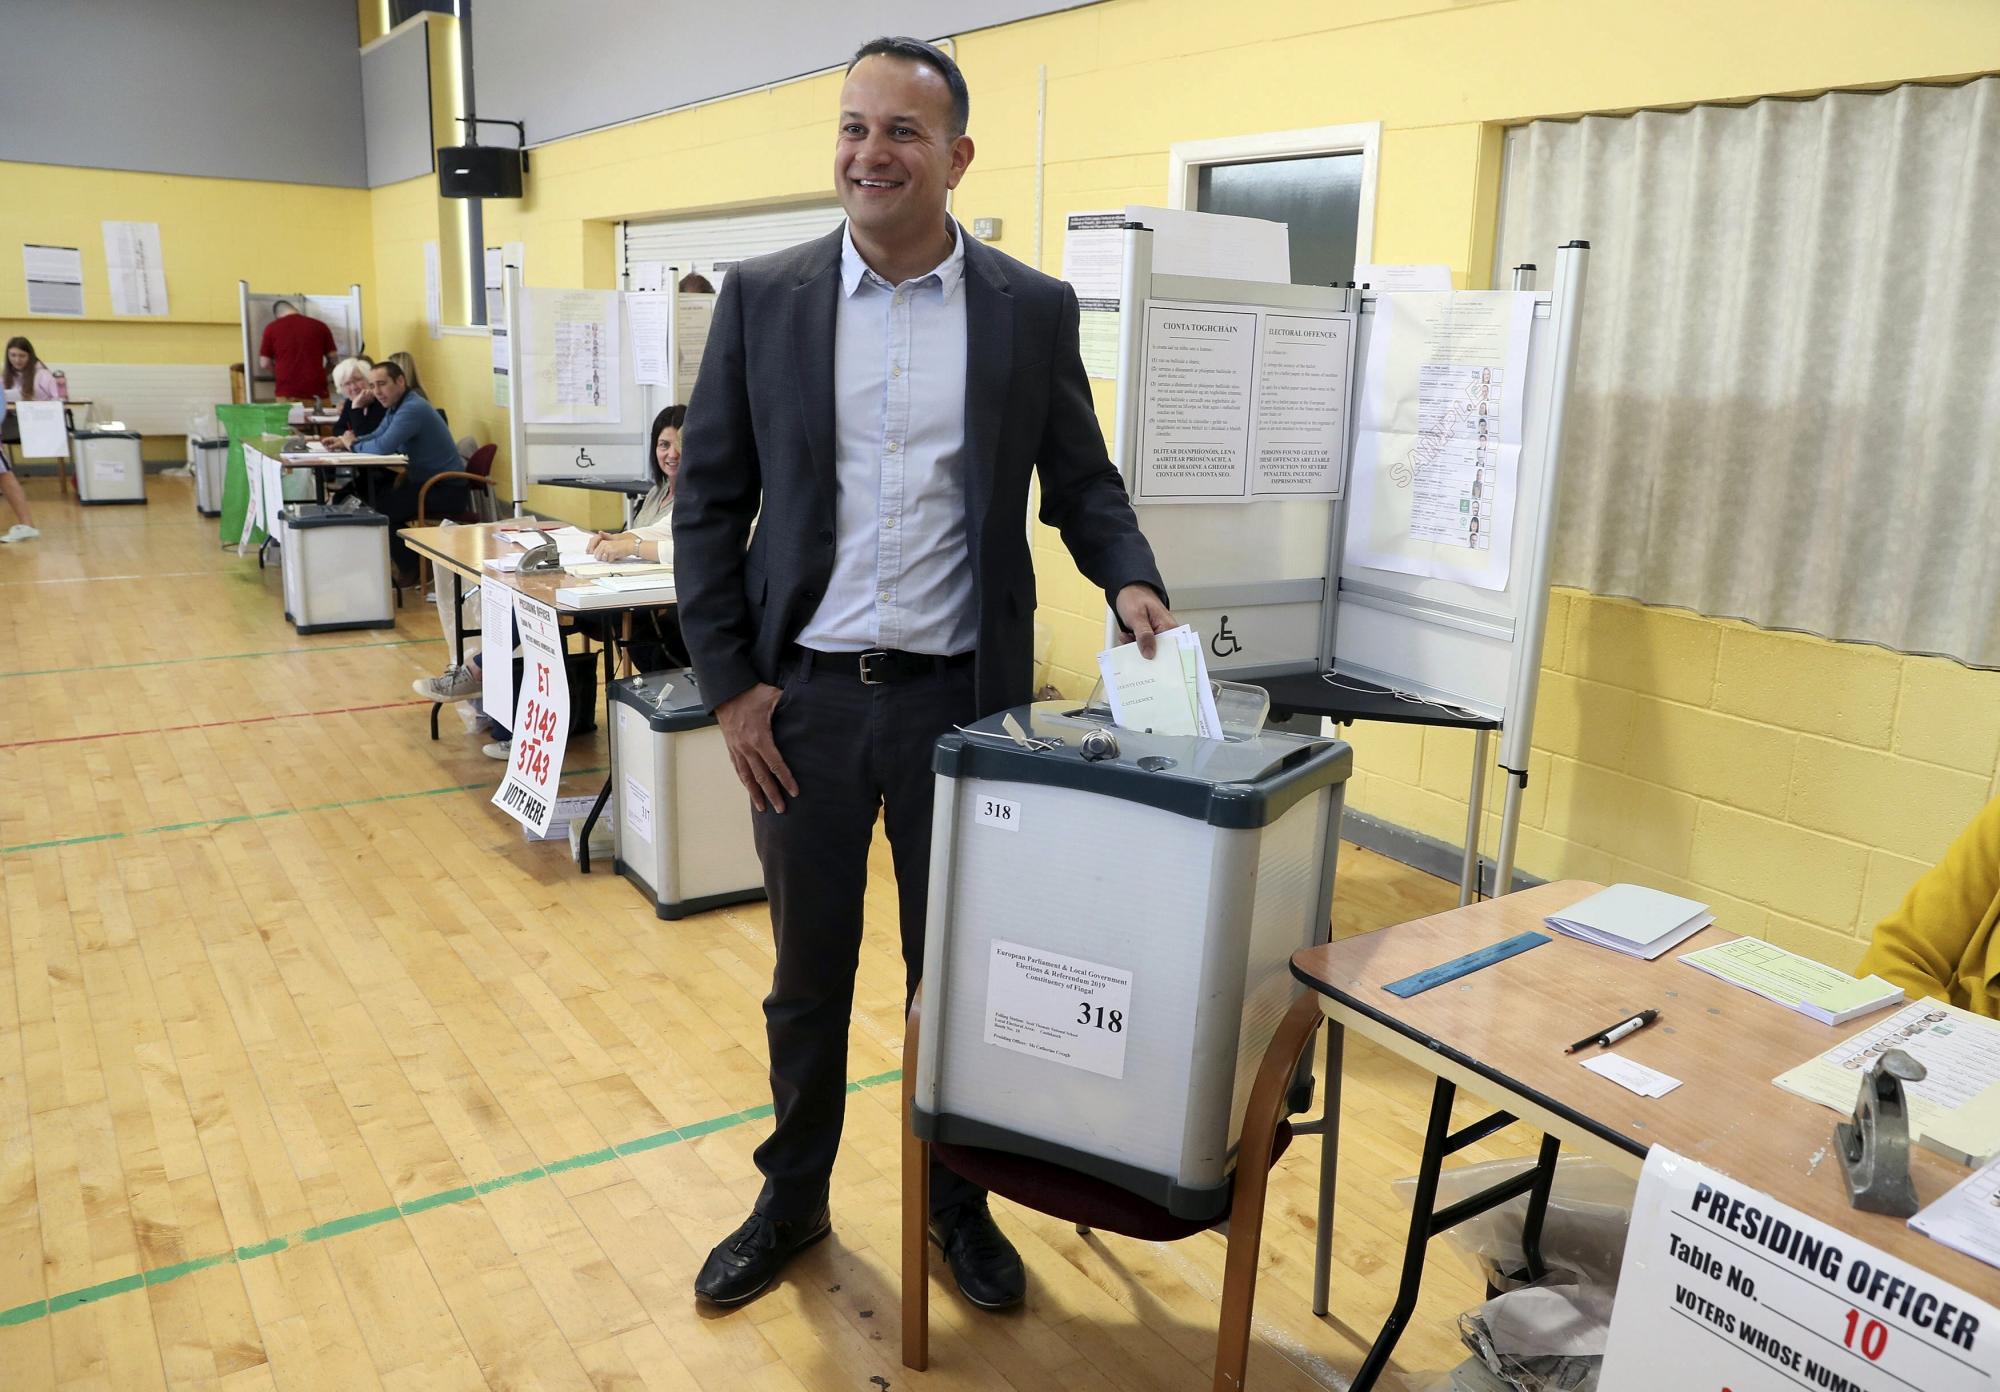 The Latest: Polls Open In Czech Republic, Centrists Seek